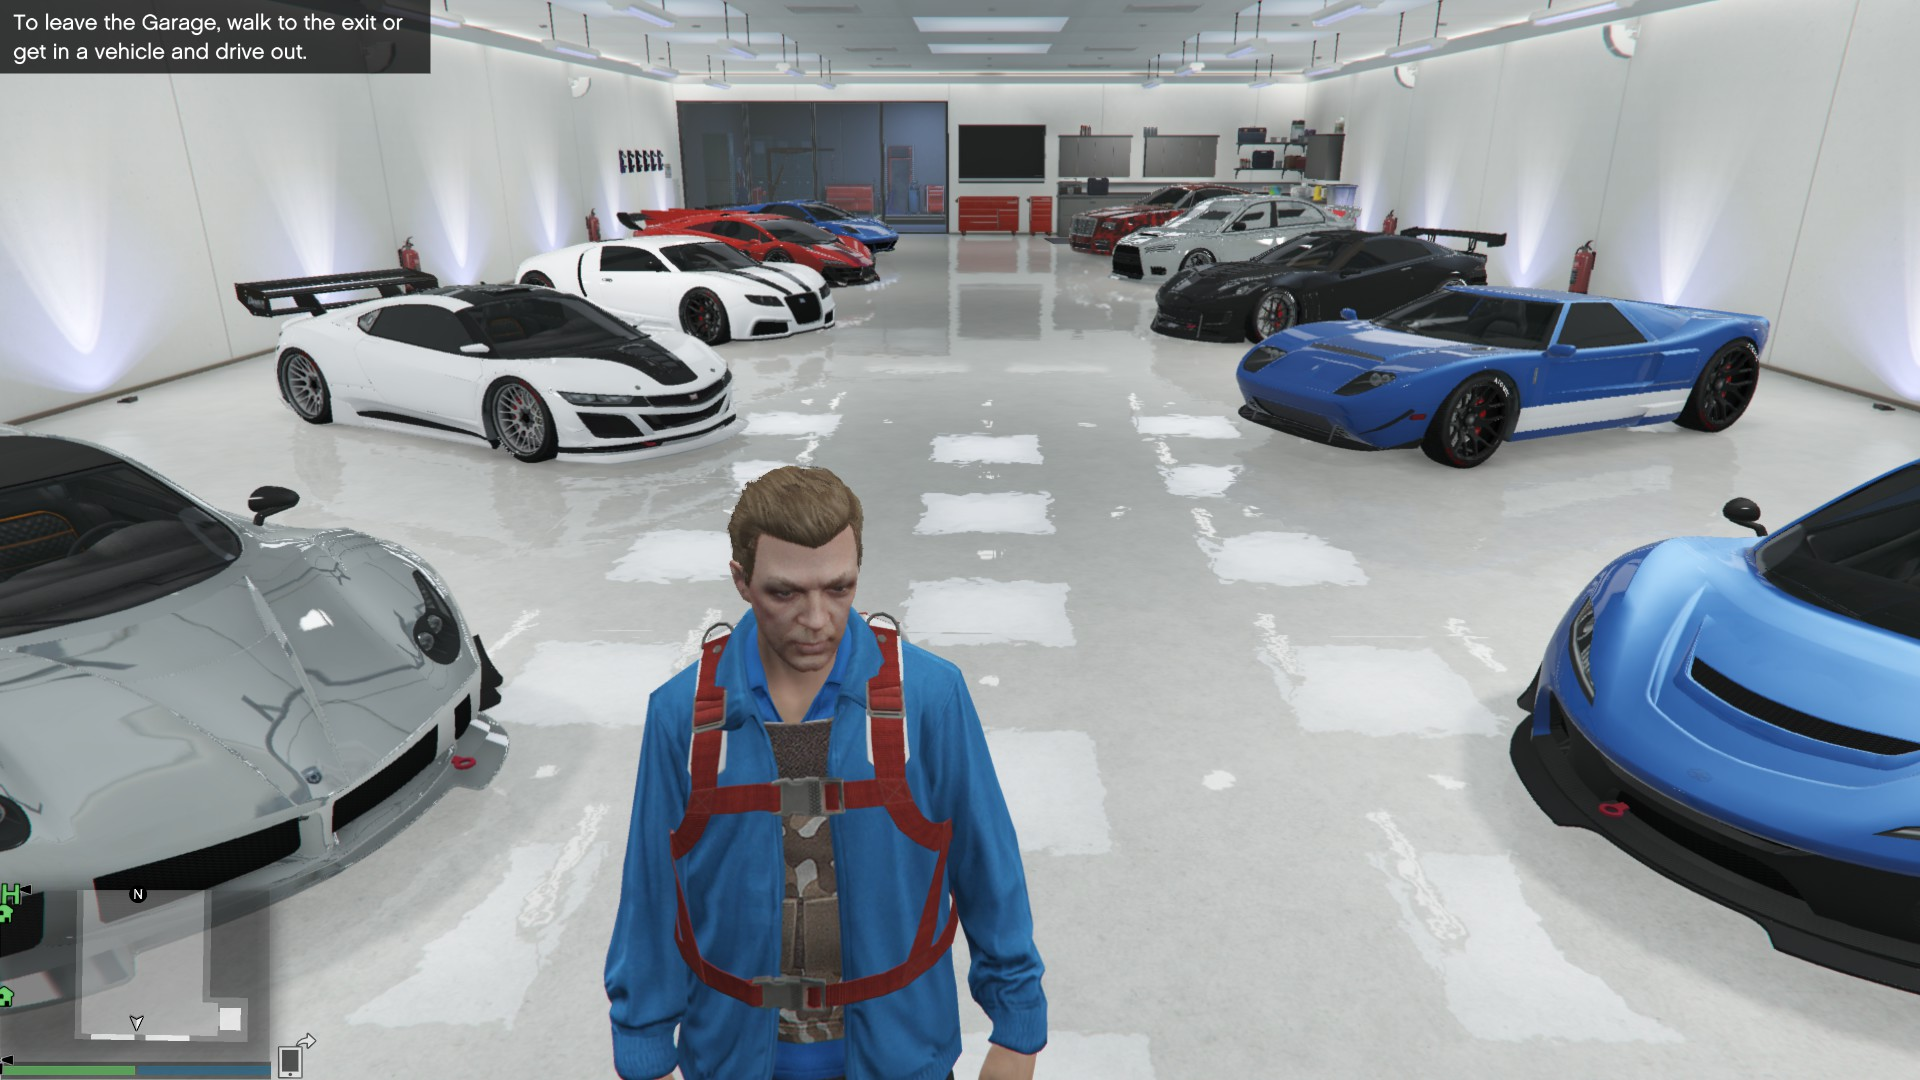 Lets See Your Best Gta Garages